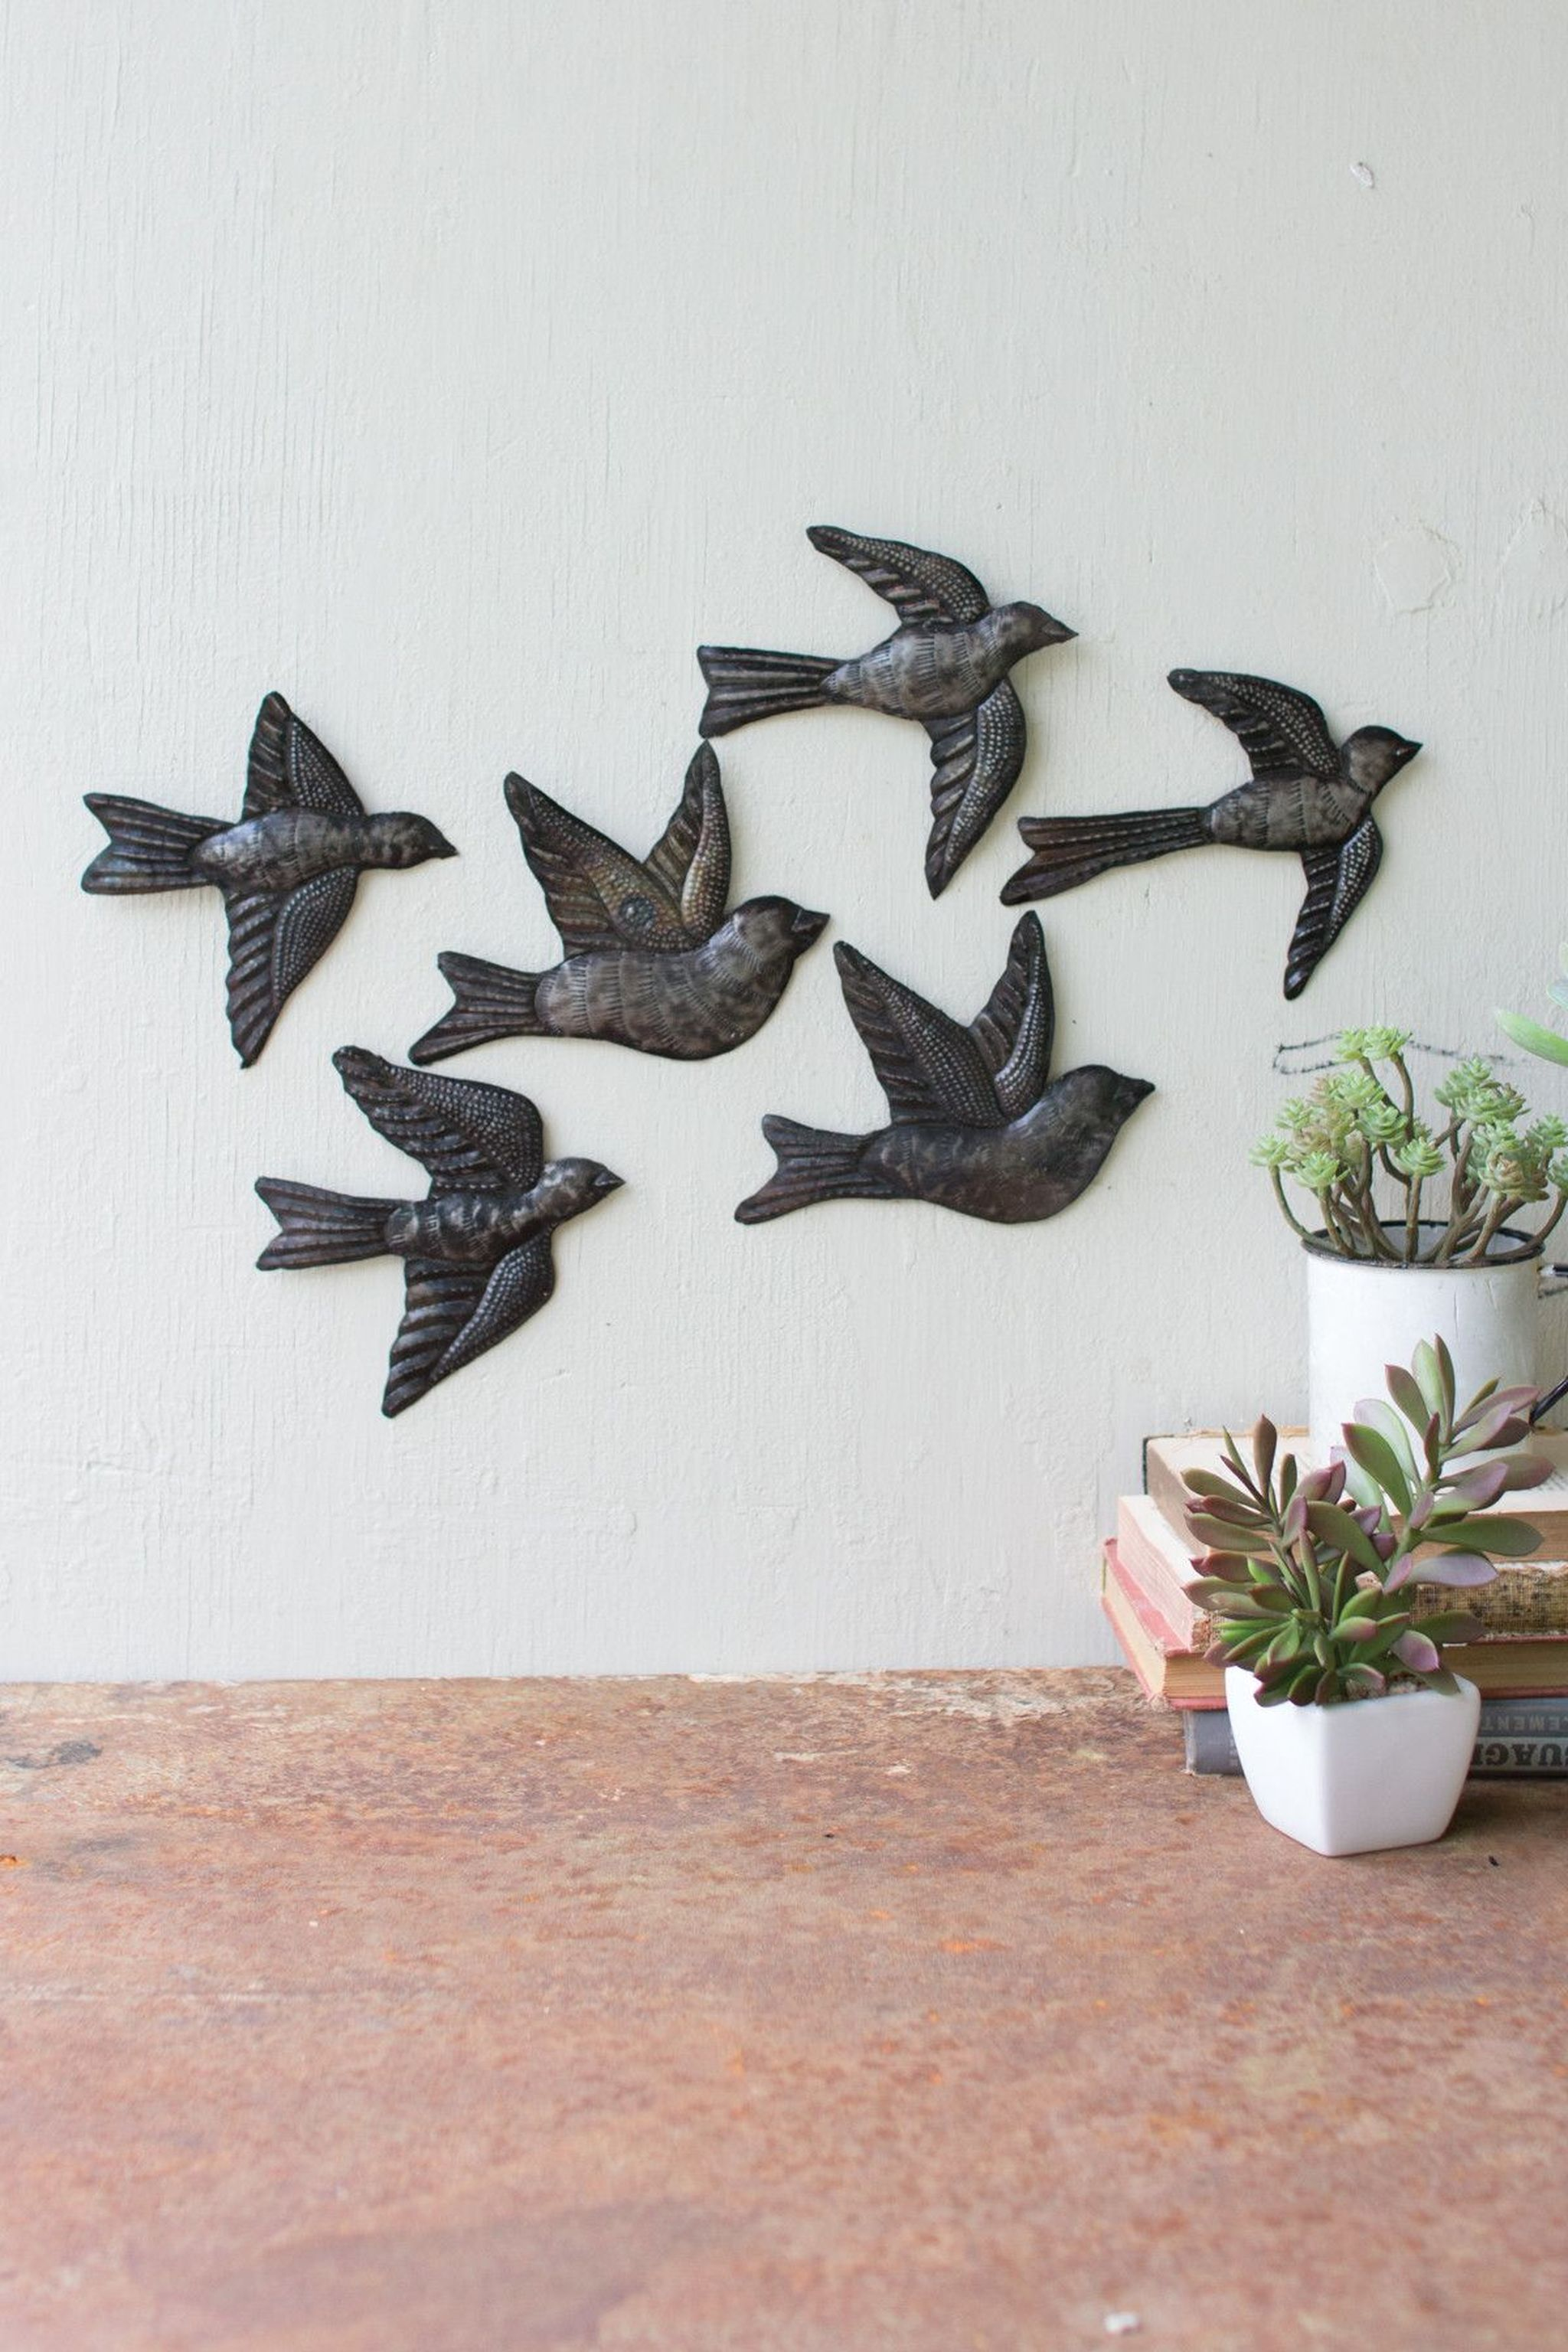 Kalalou hand hammered metal flock of sparrows wall hangings set of 495 kalalou hand hammered metal flock of sparrows wall hangings set of 6 thecheapjerseys Gallery